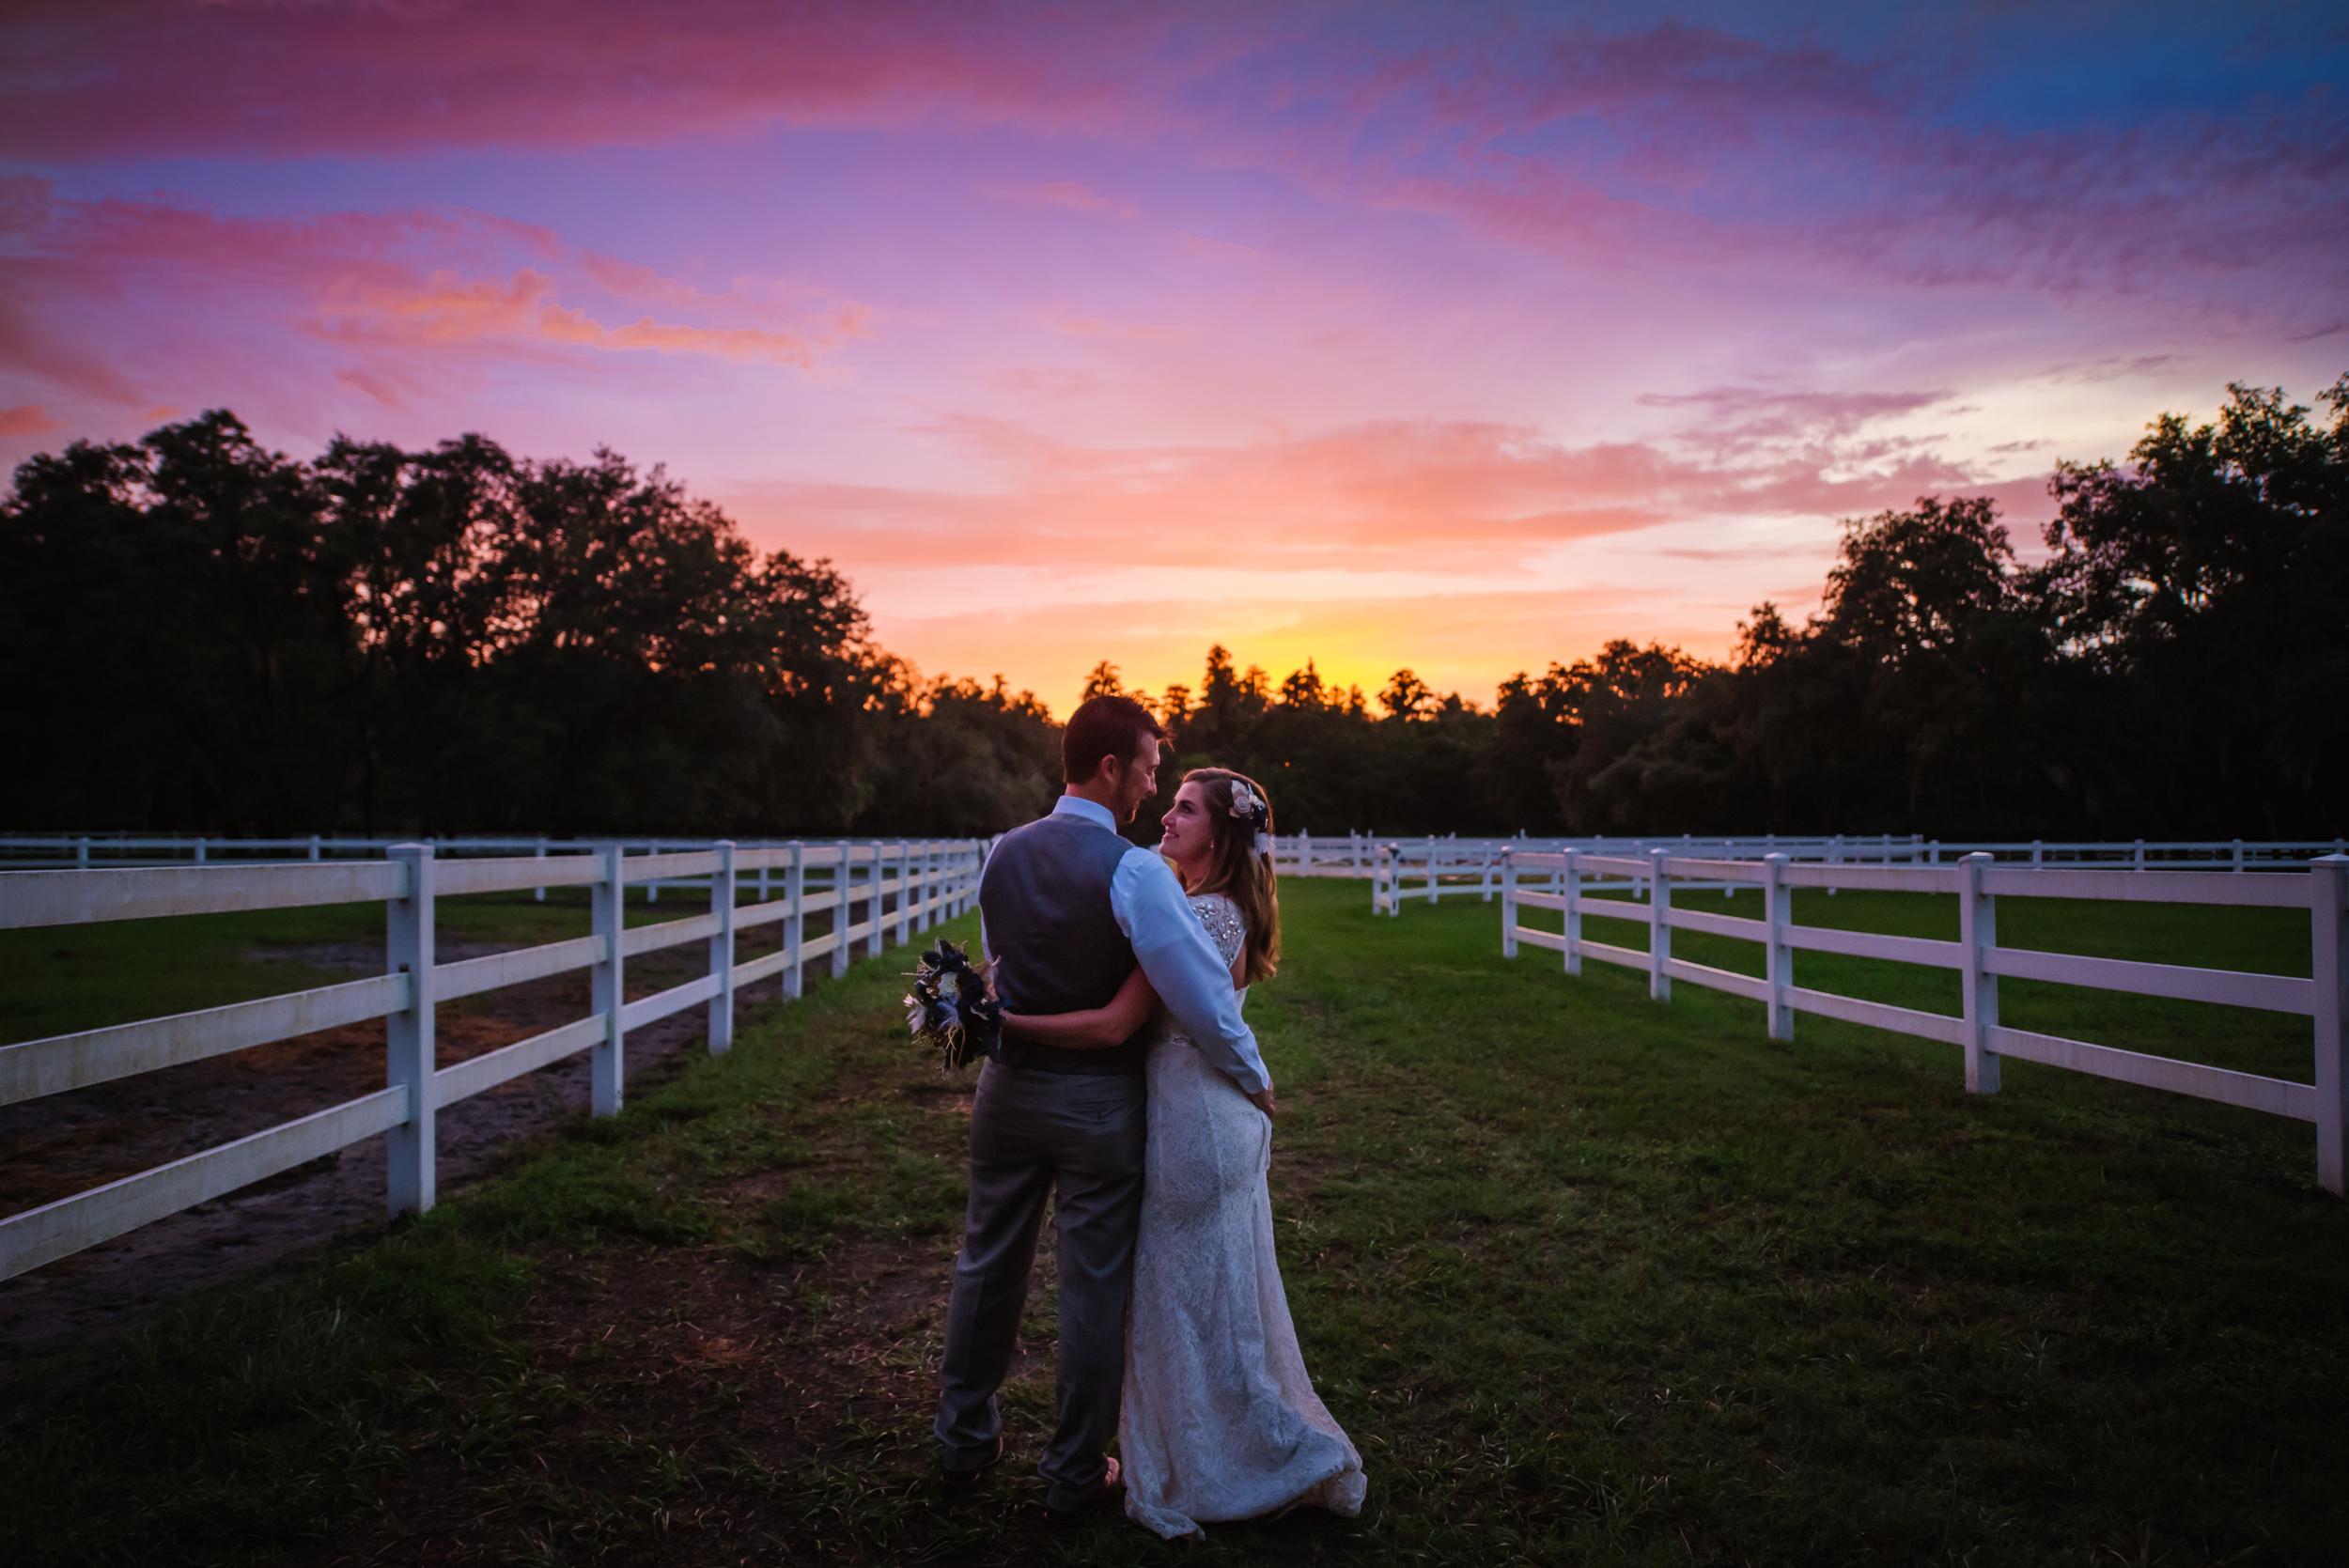 tampa-wedding-photographer-lange-farm-bride-groom-portrait-sunset-vibrant-florida